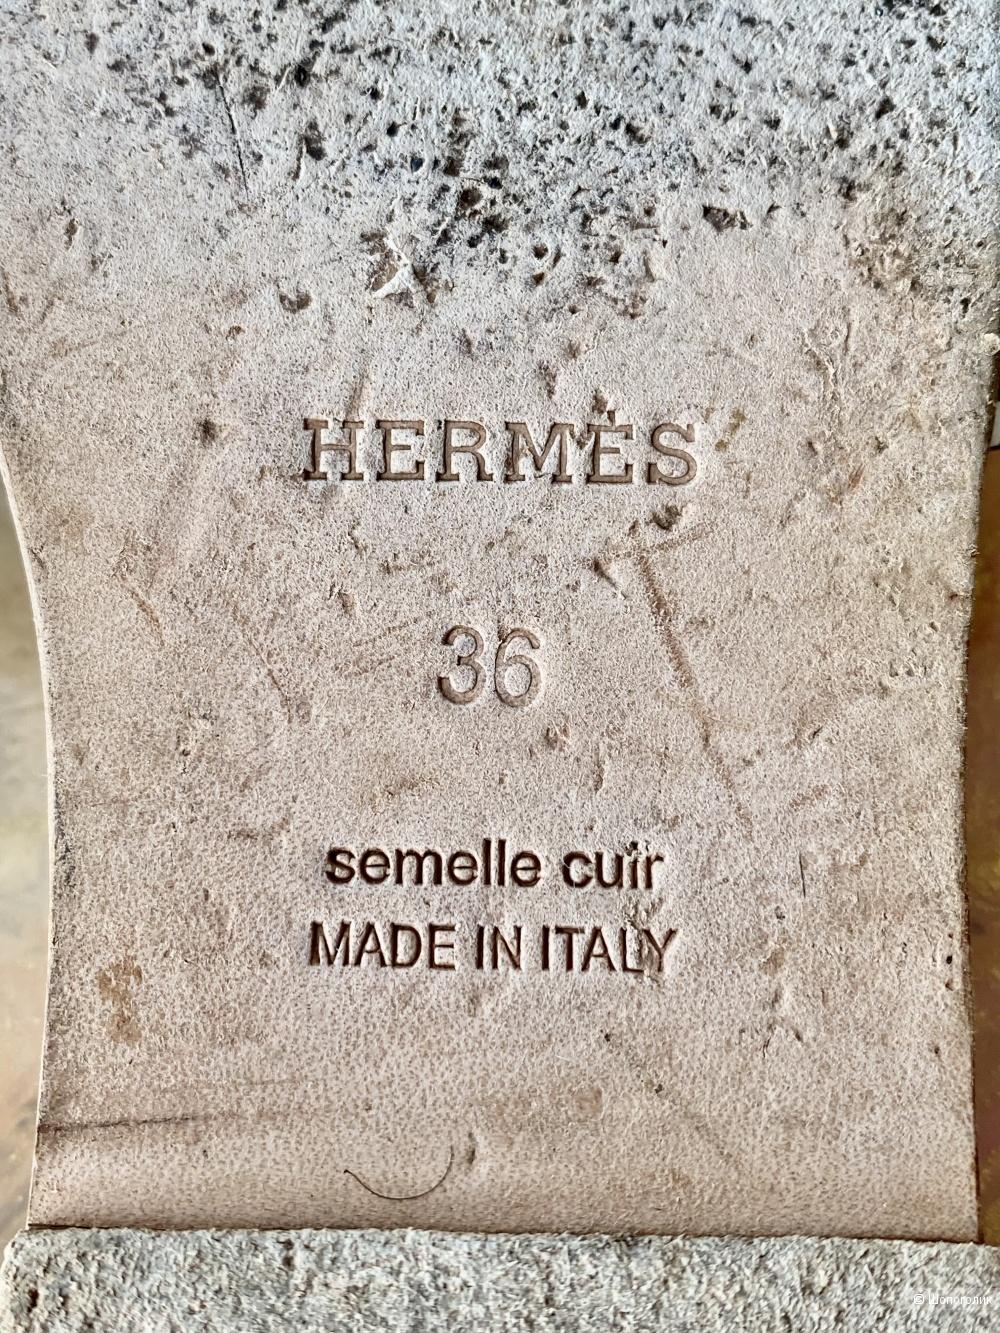 Шлепки Hermes, размер 36.